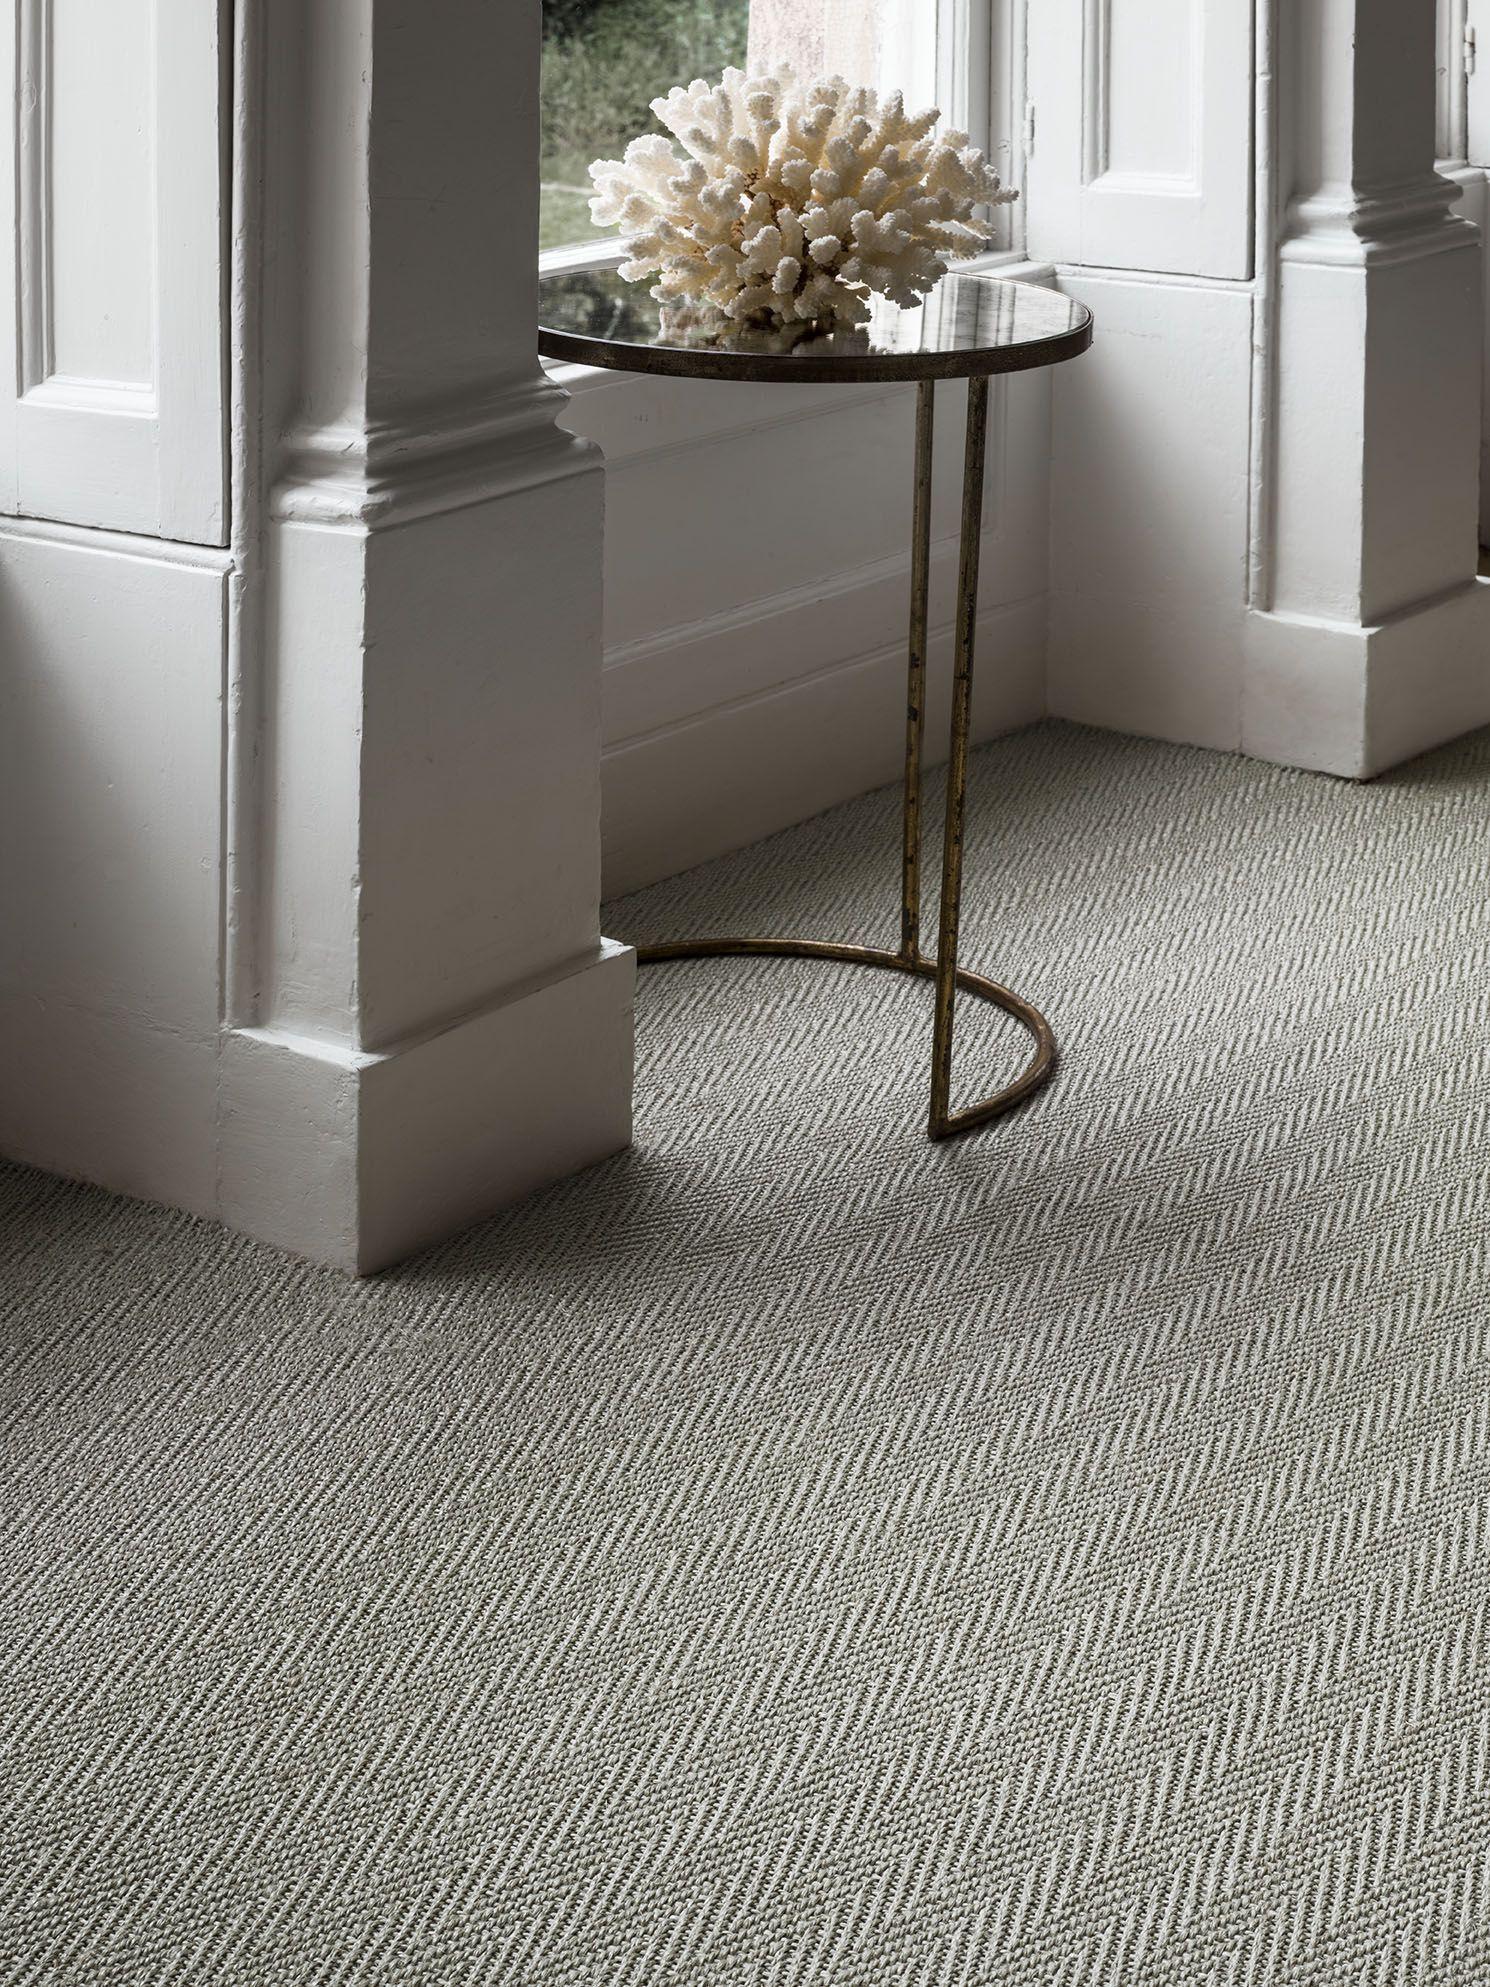 Good Photographs Herringbone Carpet Living Room Thoughts Develop You Prefer Thes Carpet Develop Good He In 2020 Patterned Carpet Carpet Stairs Living Room Carpet